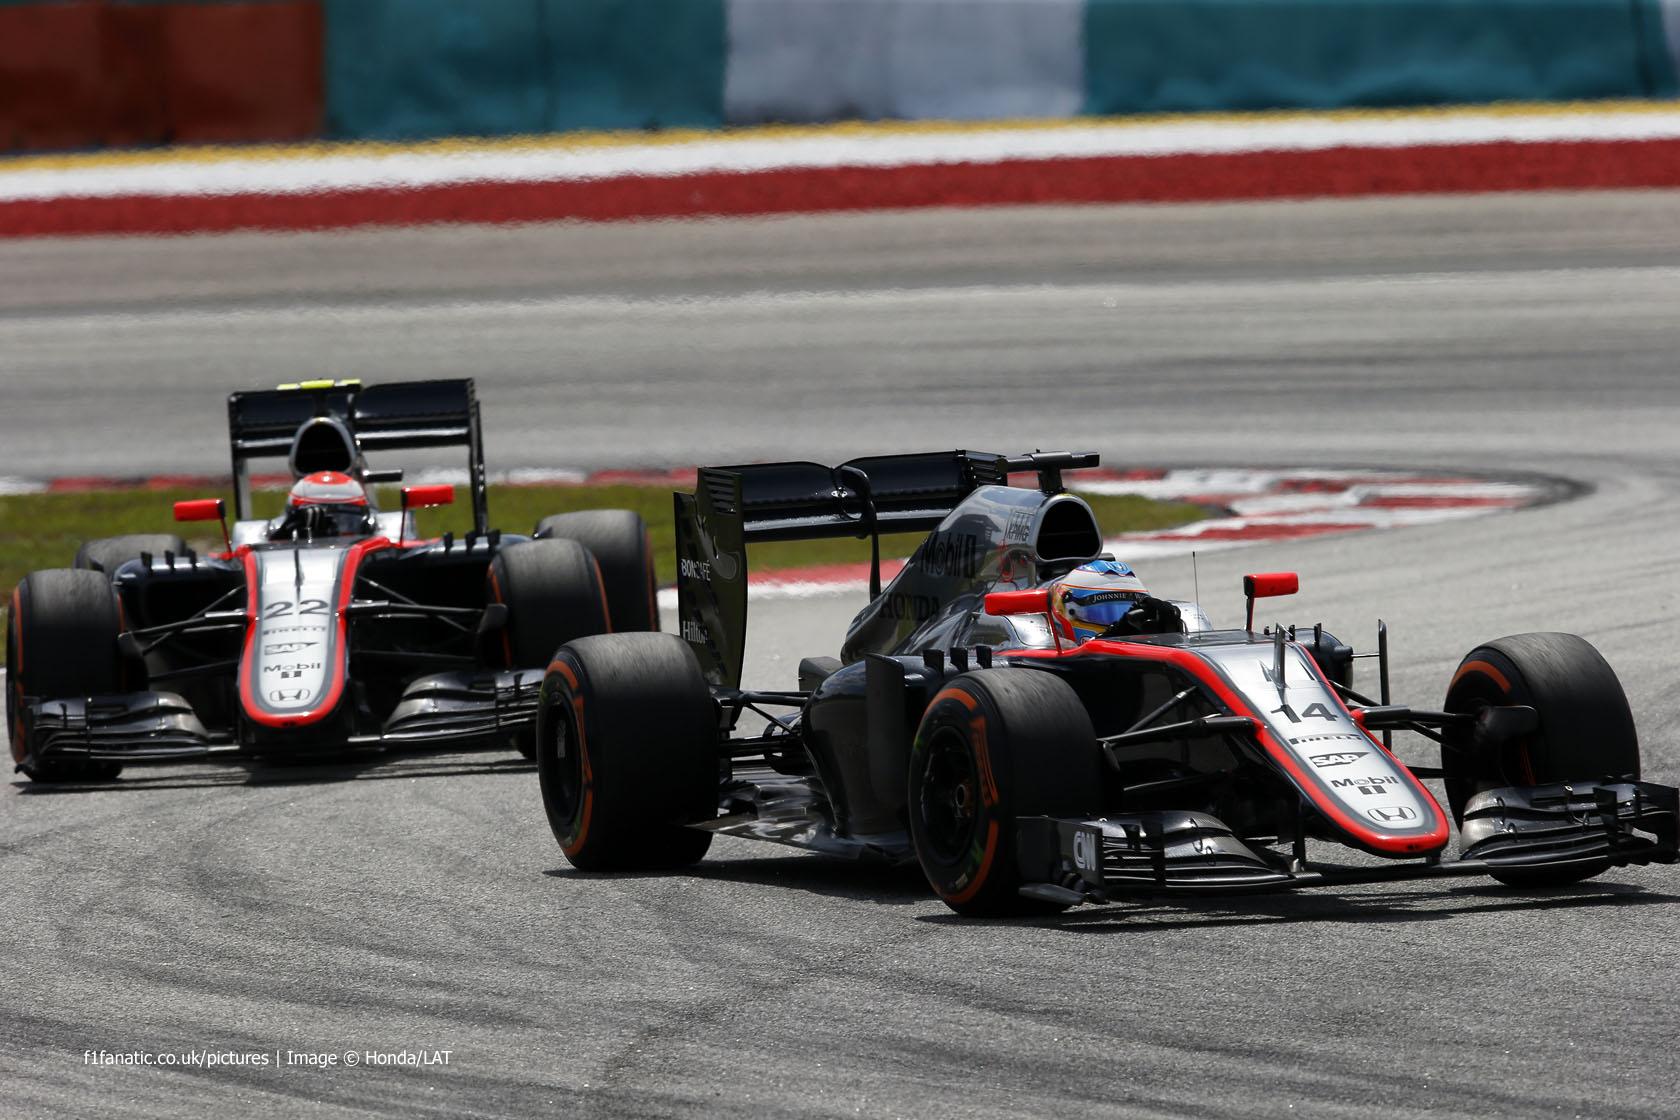 Fernando Alonso, Jenson Button, McLaren, Sepang International Circuit, 2015